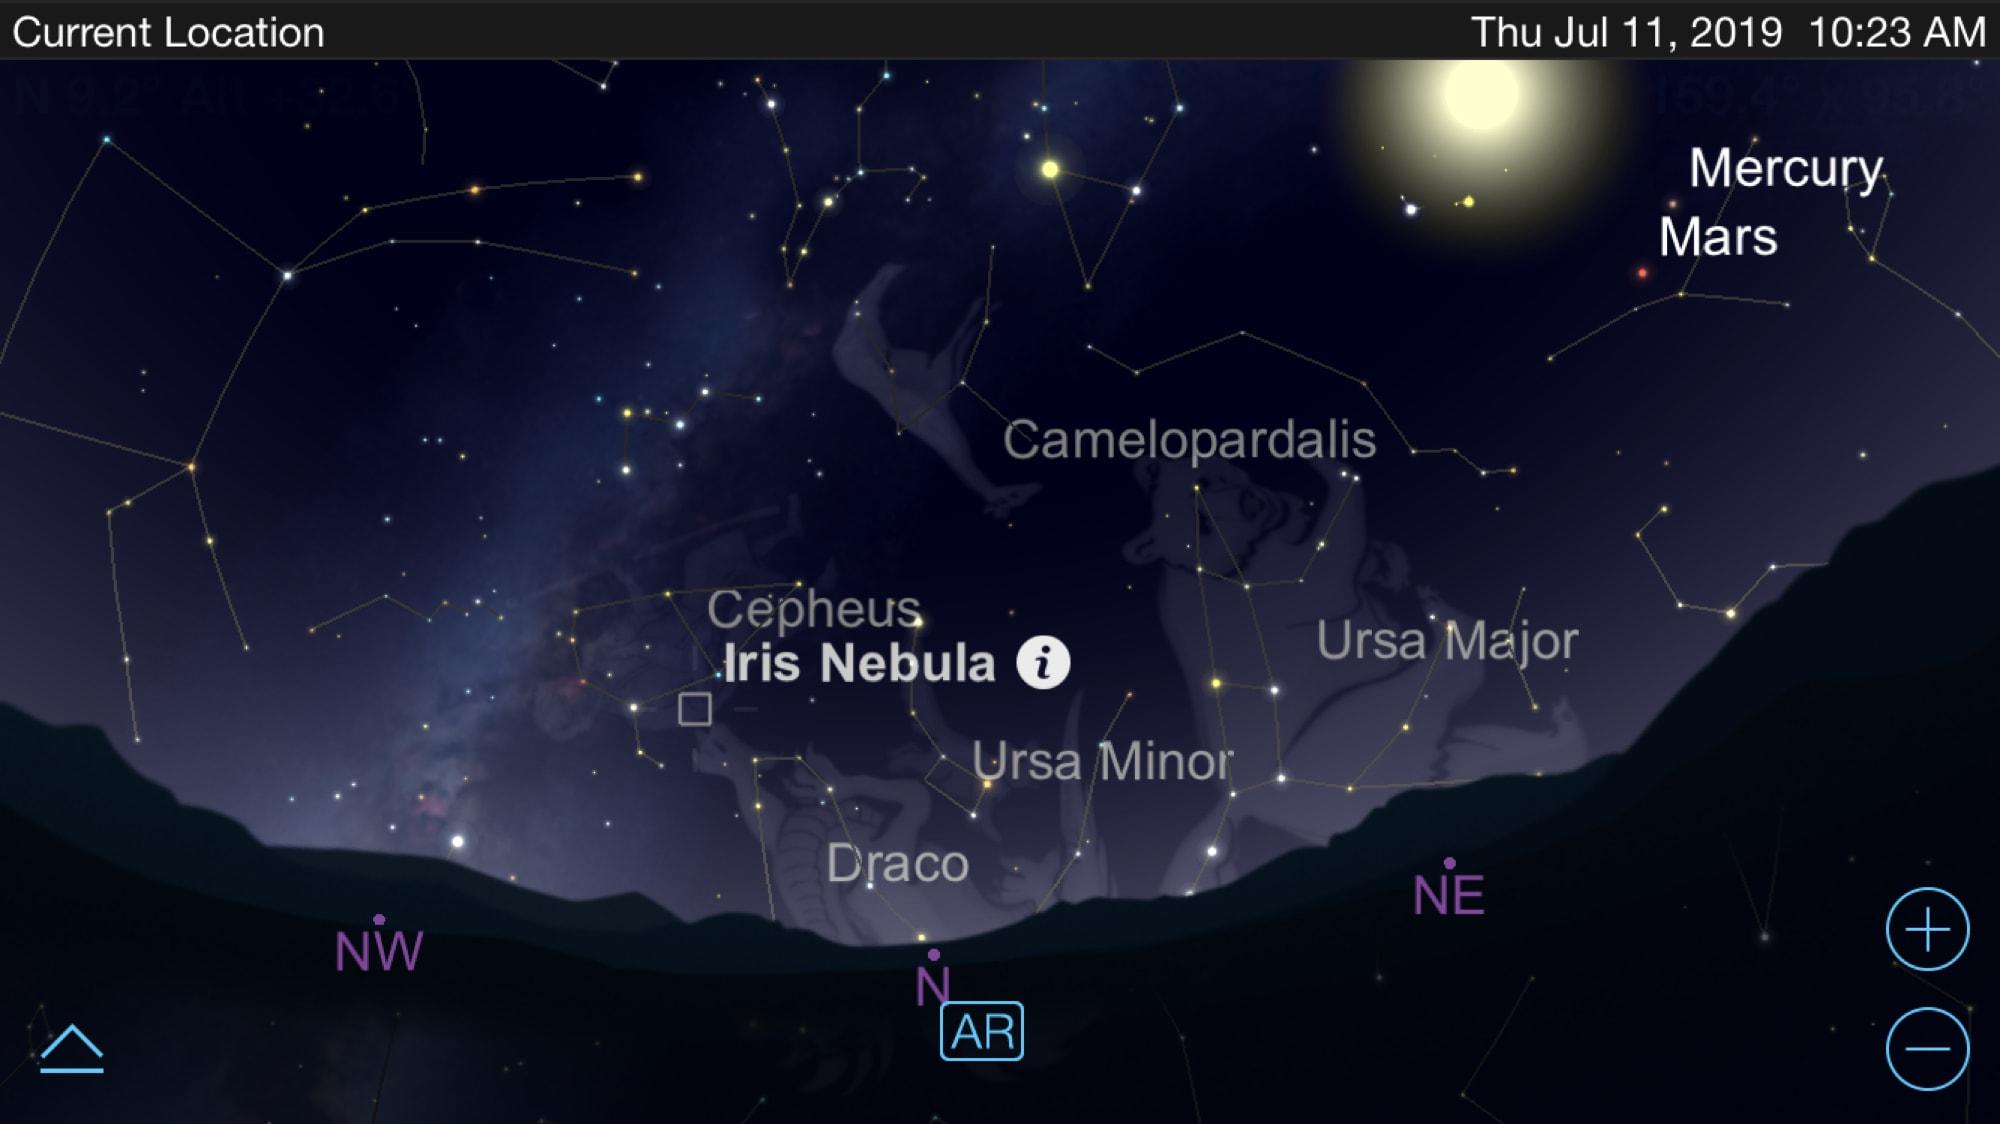 Astronomy apps for iPhone - SkySafari